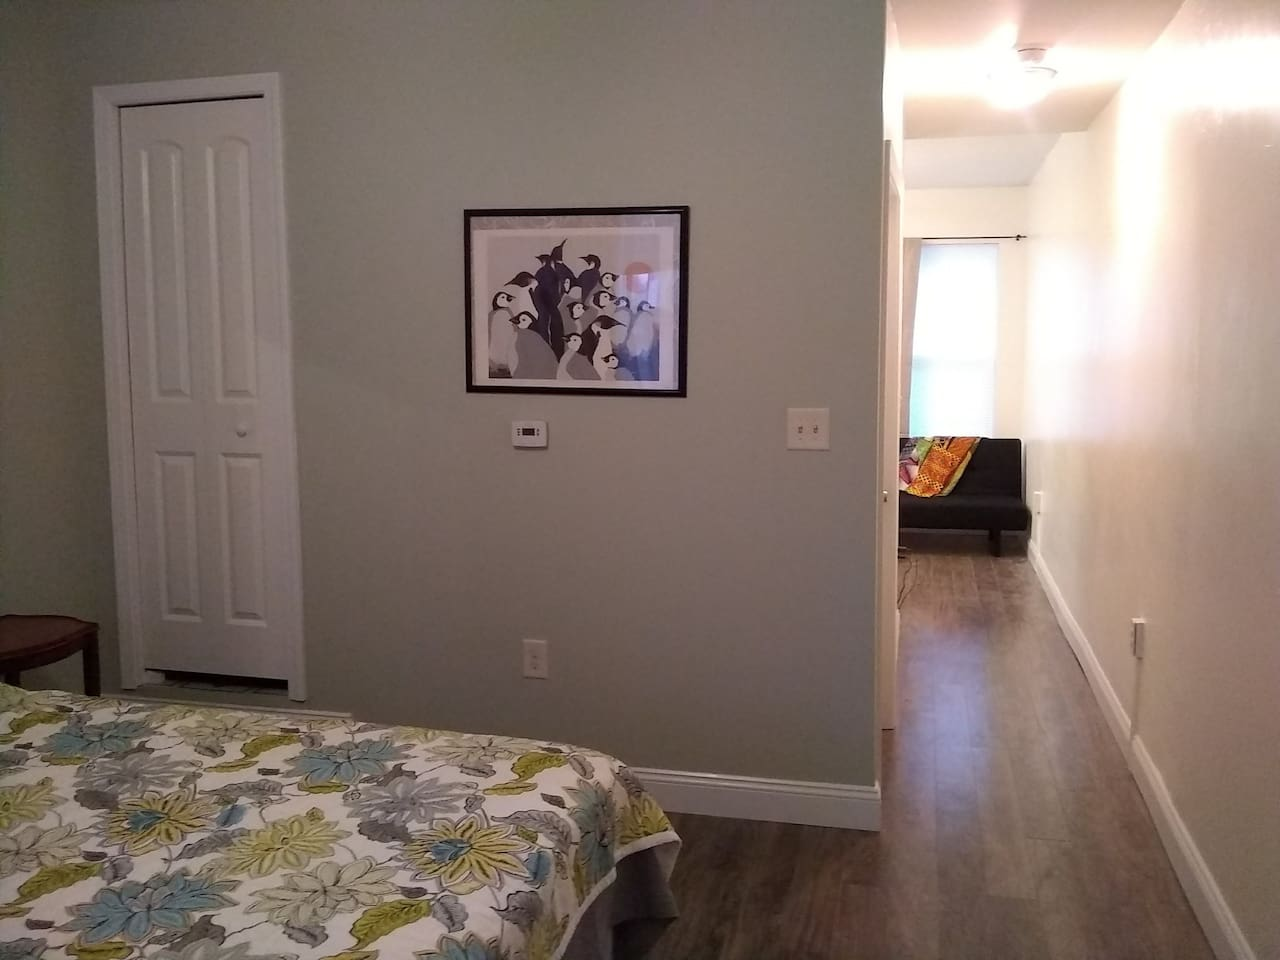 Closet and hallway